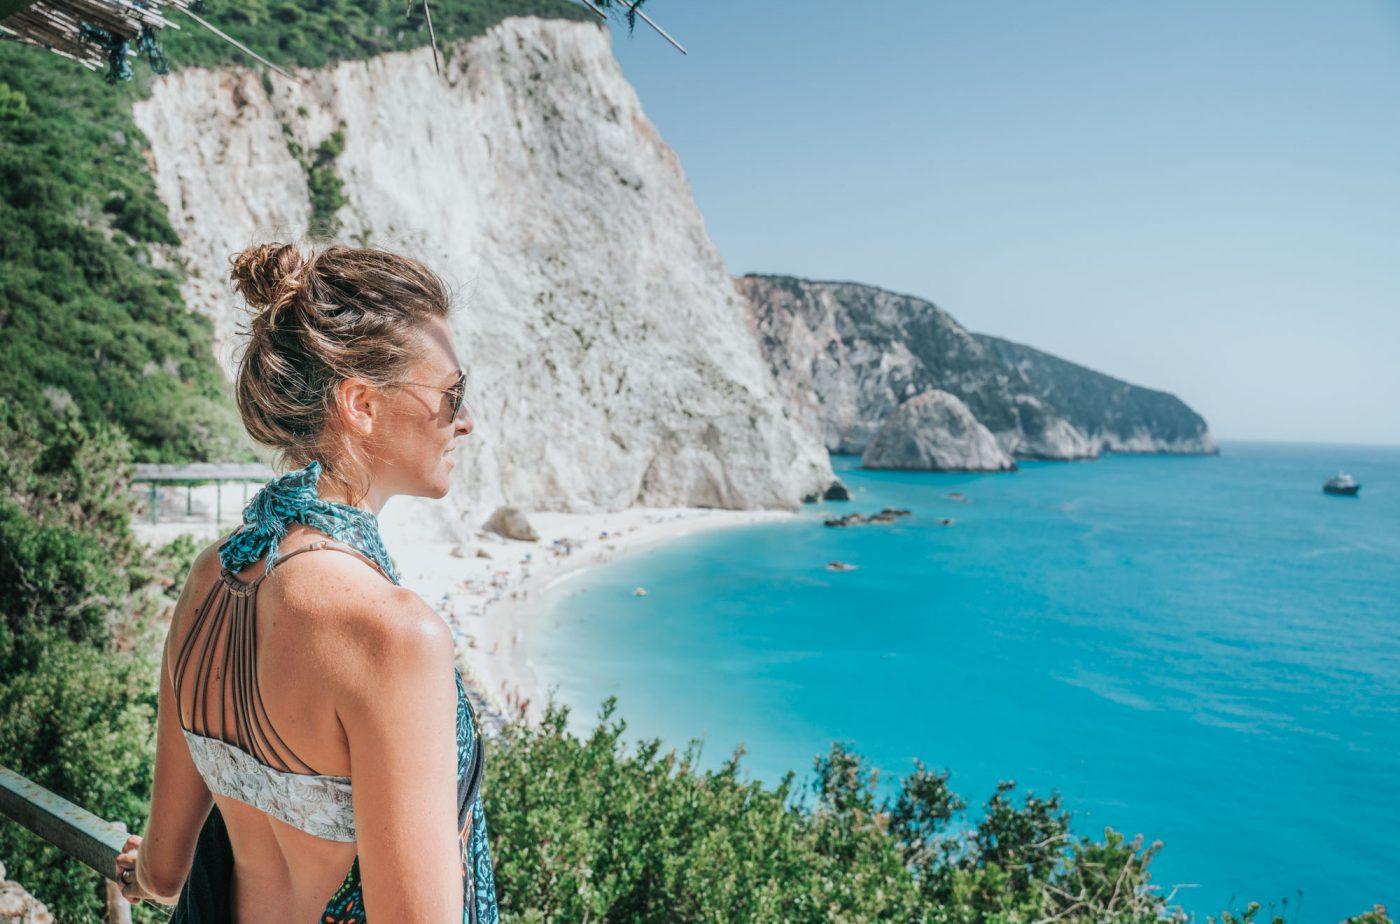 Porto Katsiki is one of the Best beaches in Lefkada